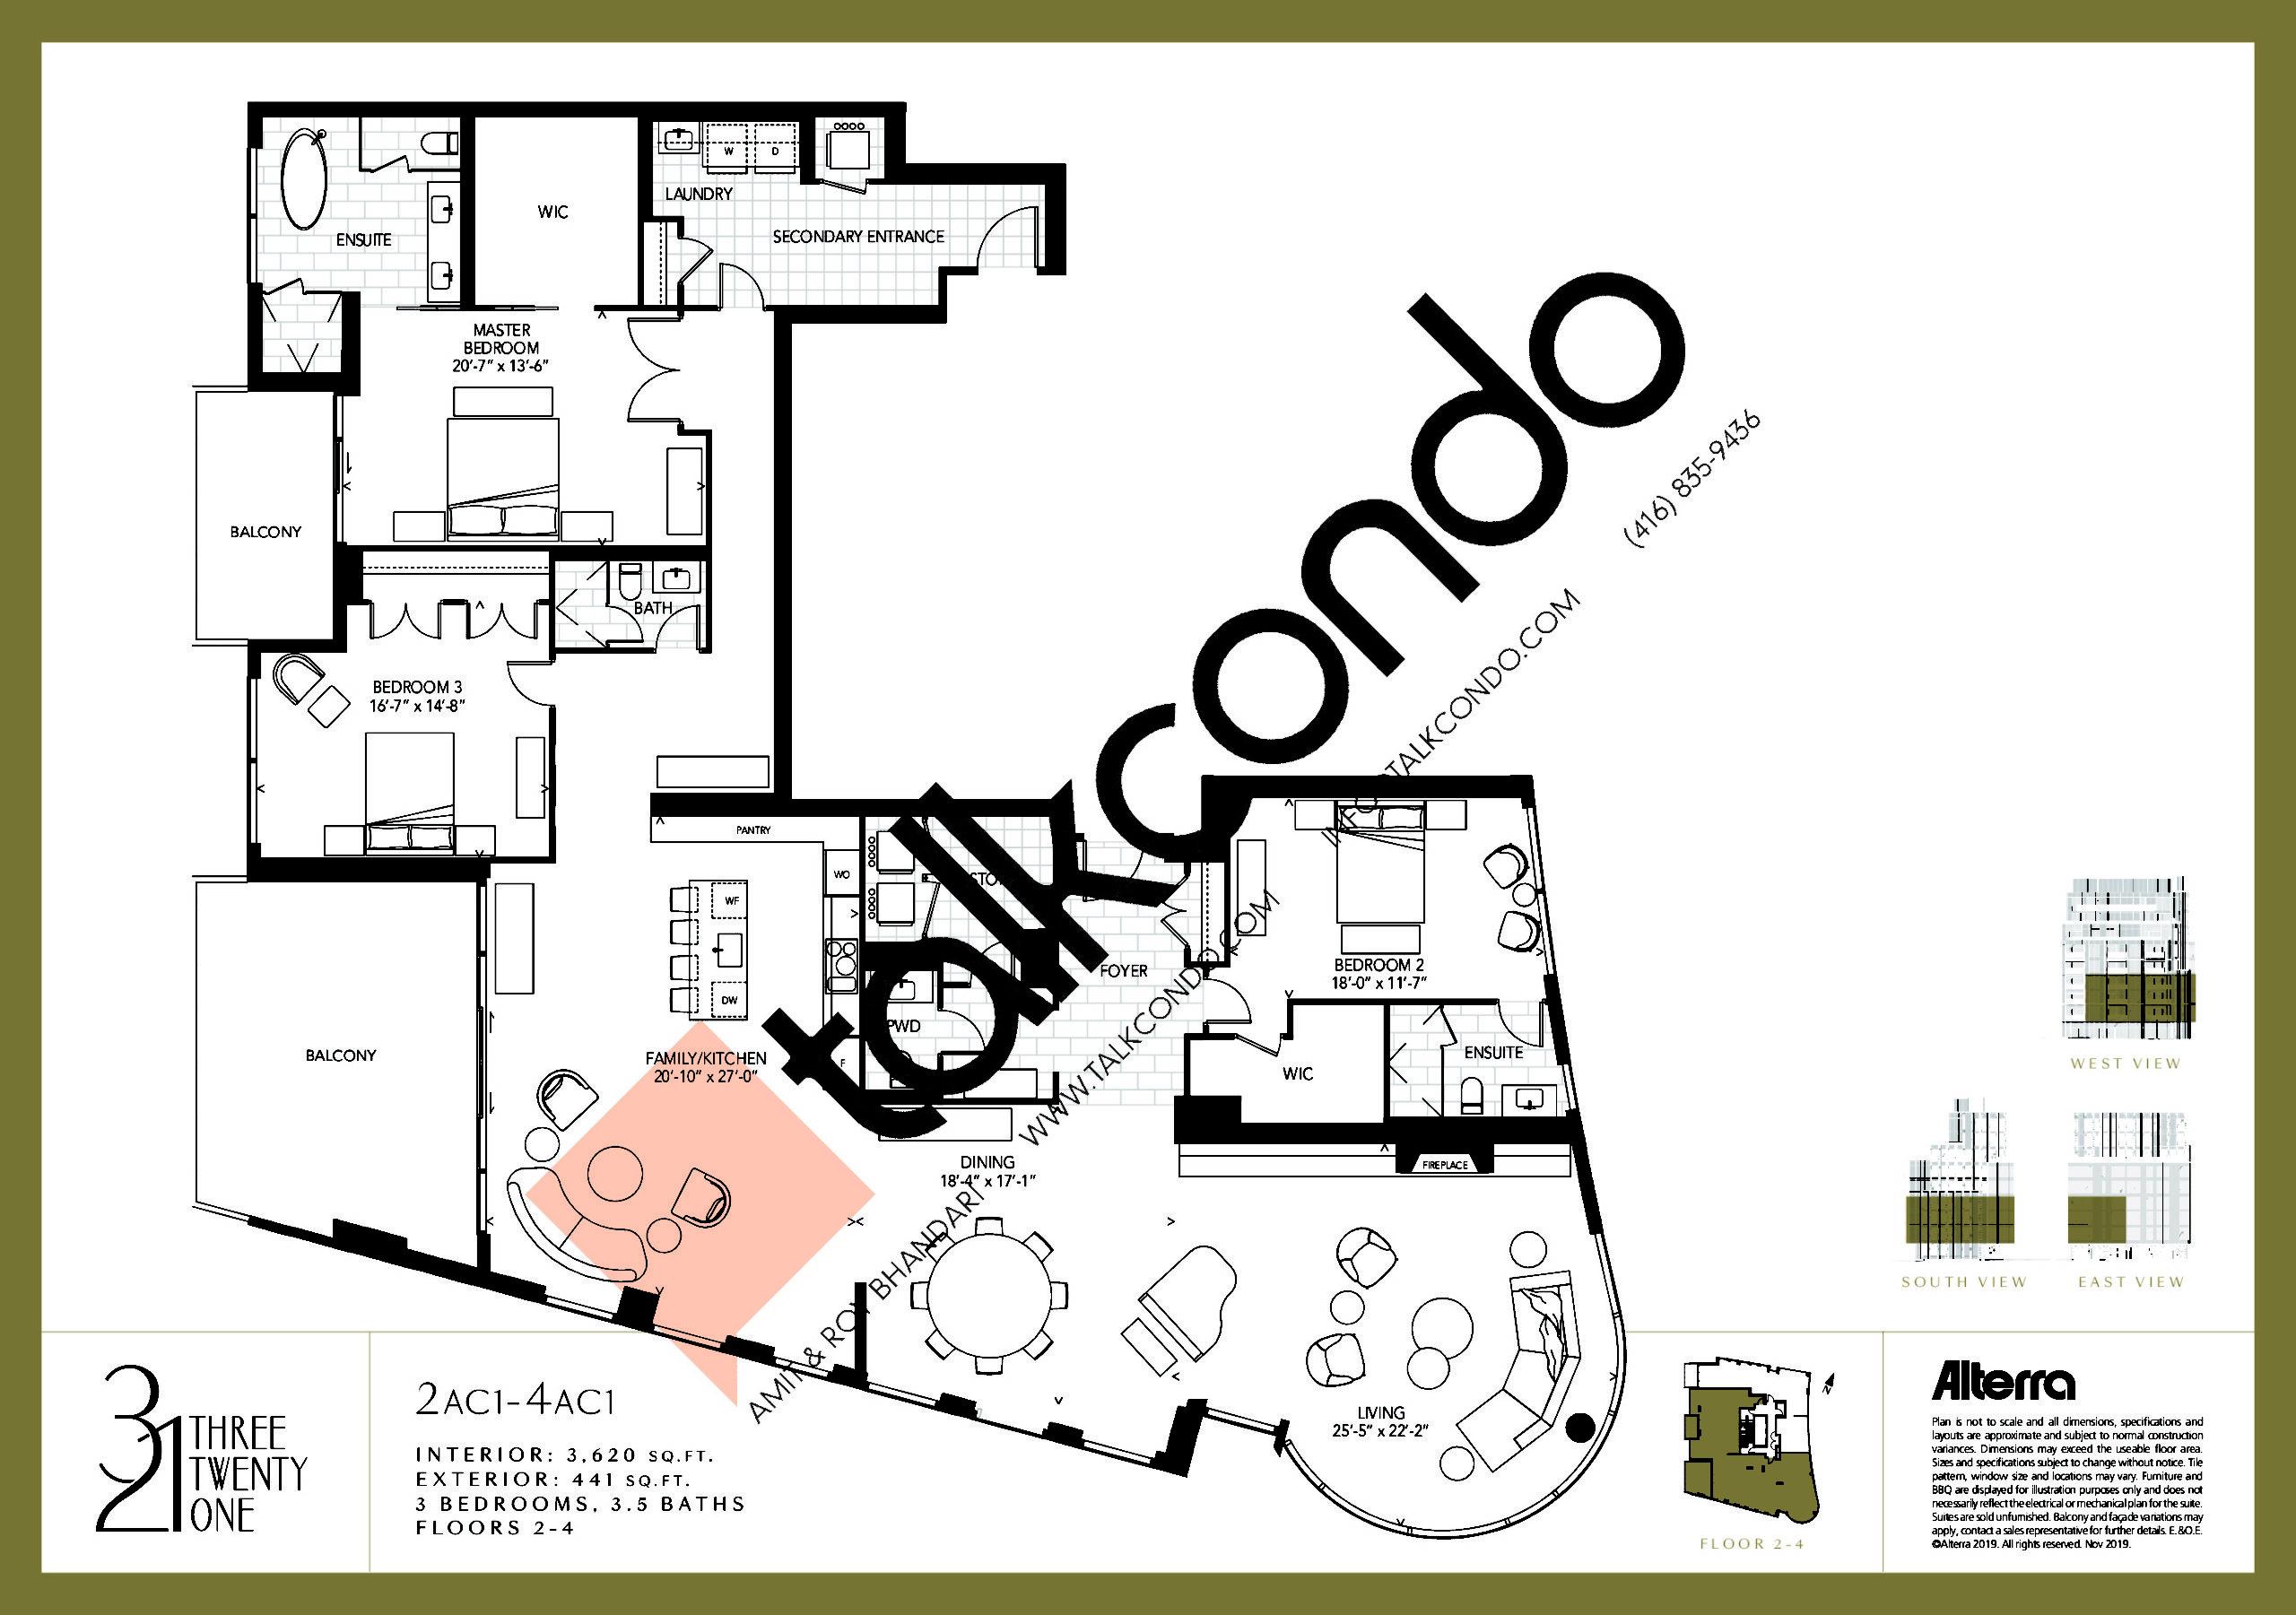 2AC1-4AC1 Floor Plan at 321 Davenport Condos - 3620 sq.ft